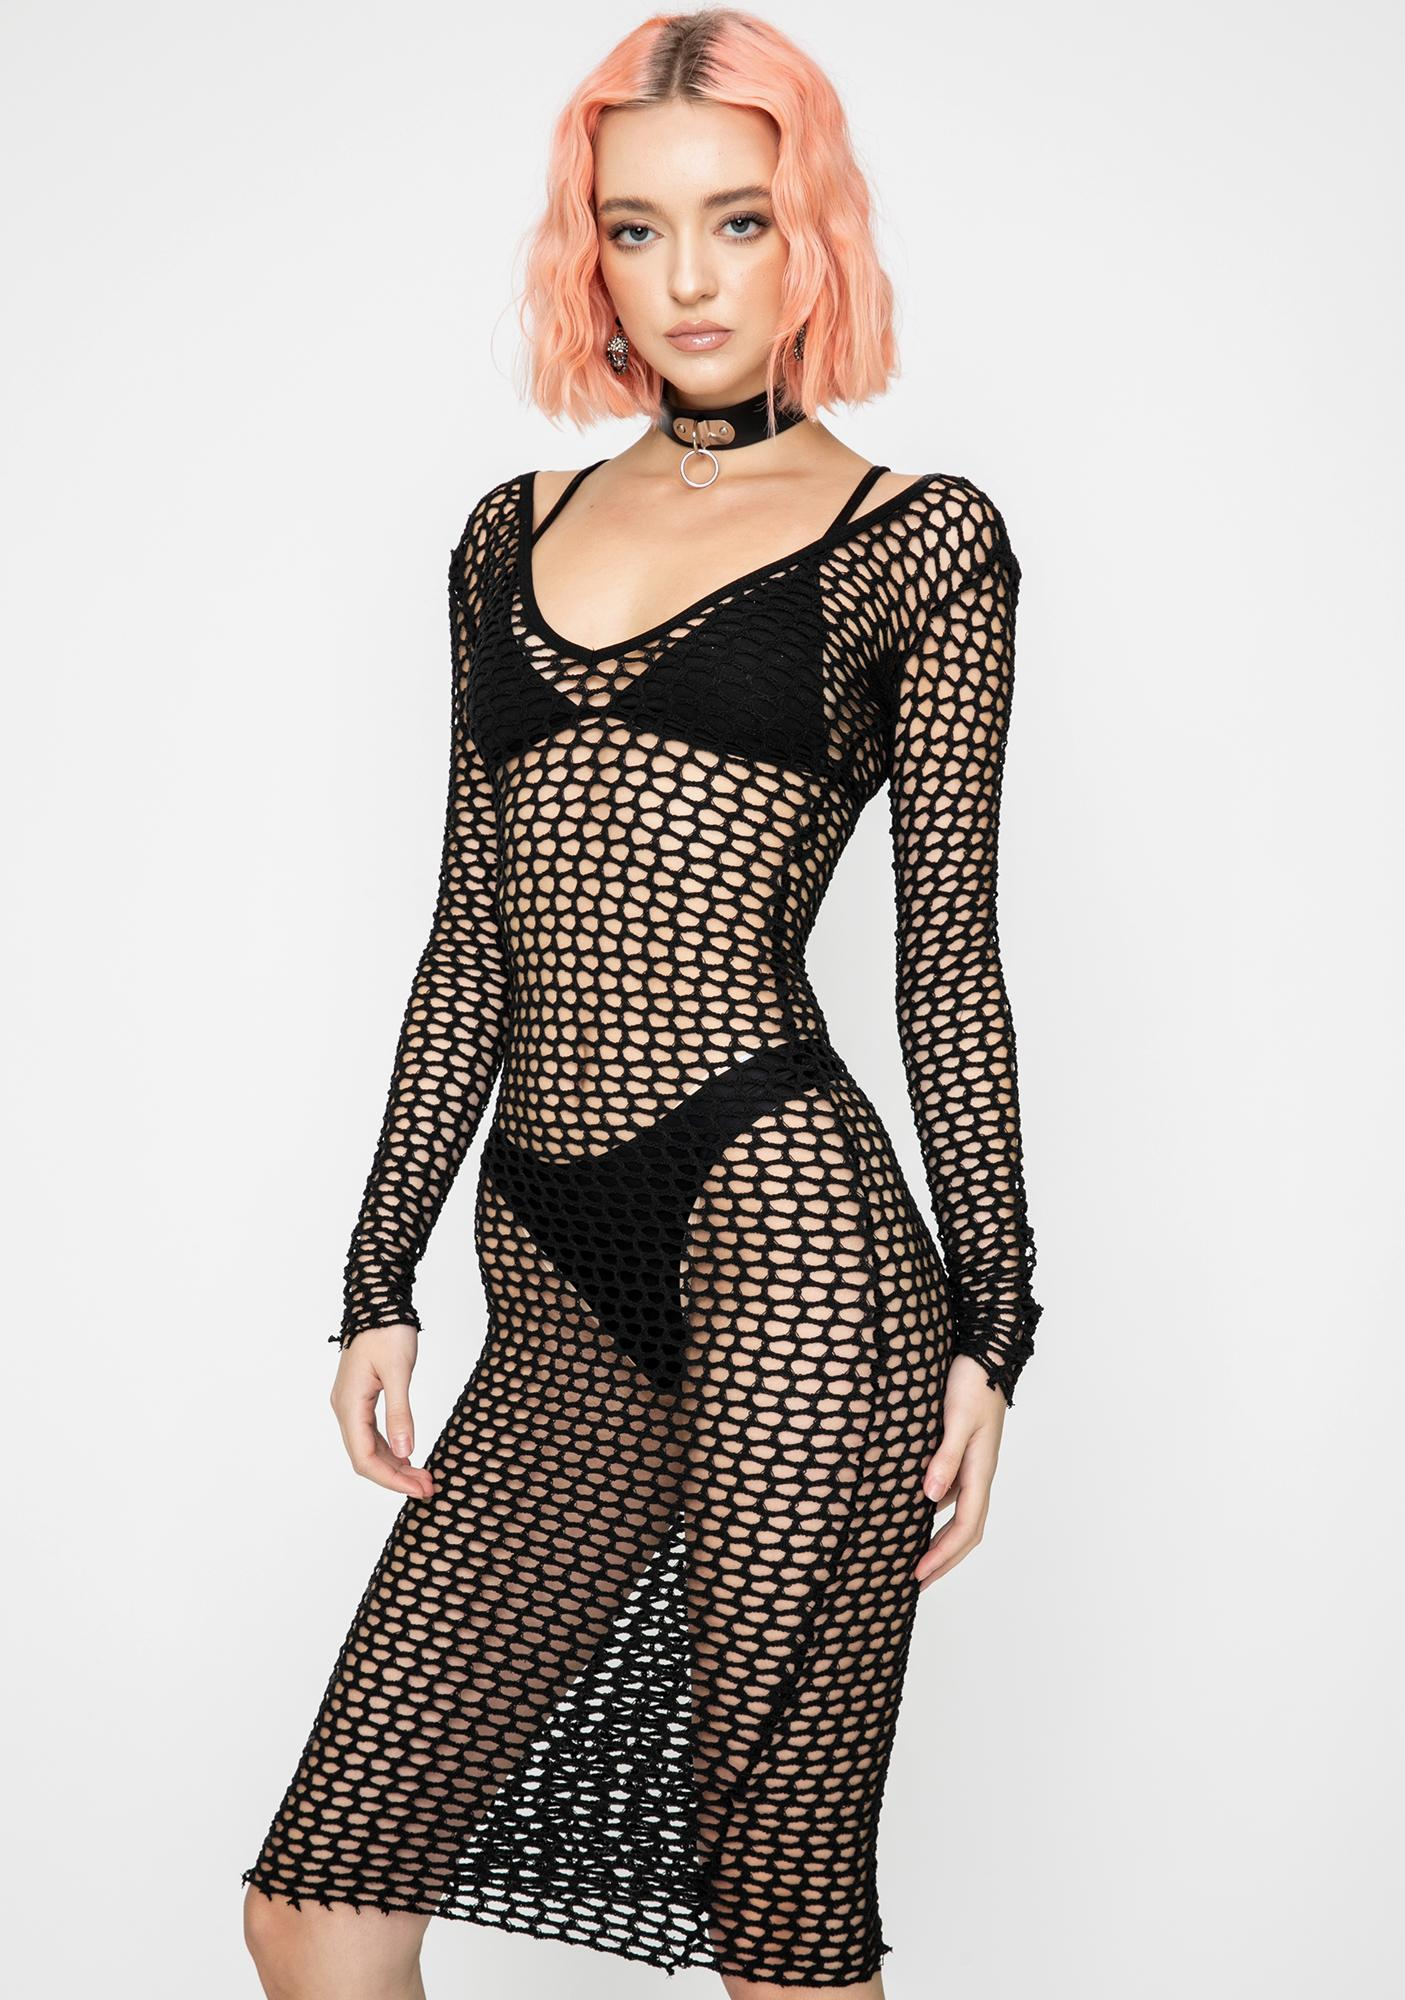 Kiki Riki Mic Drop Mesh Dress